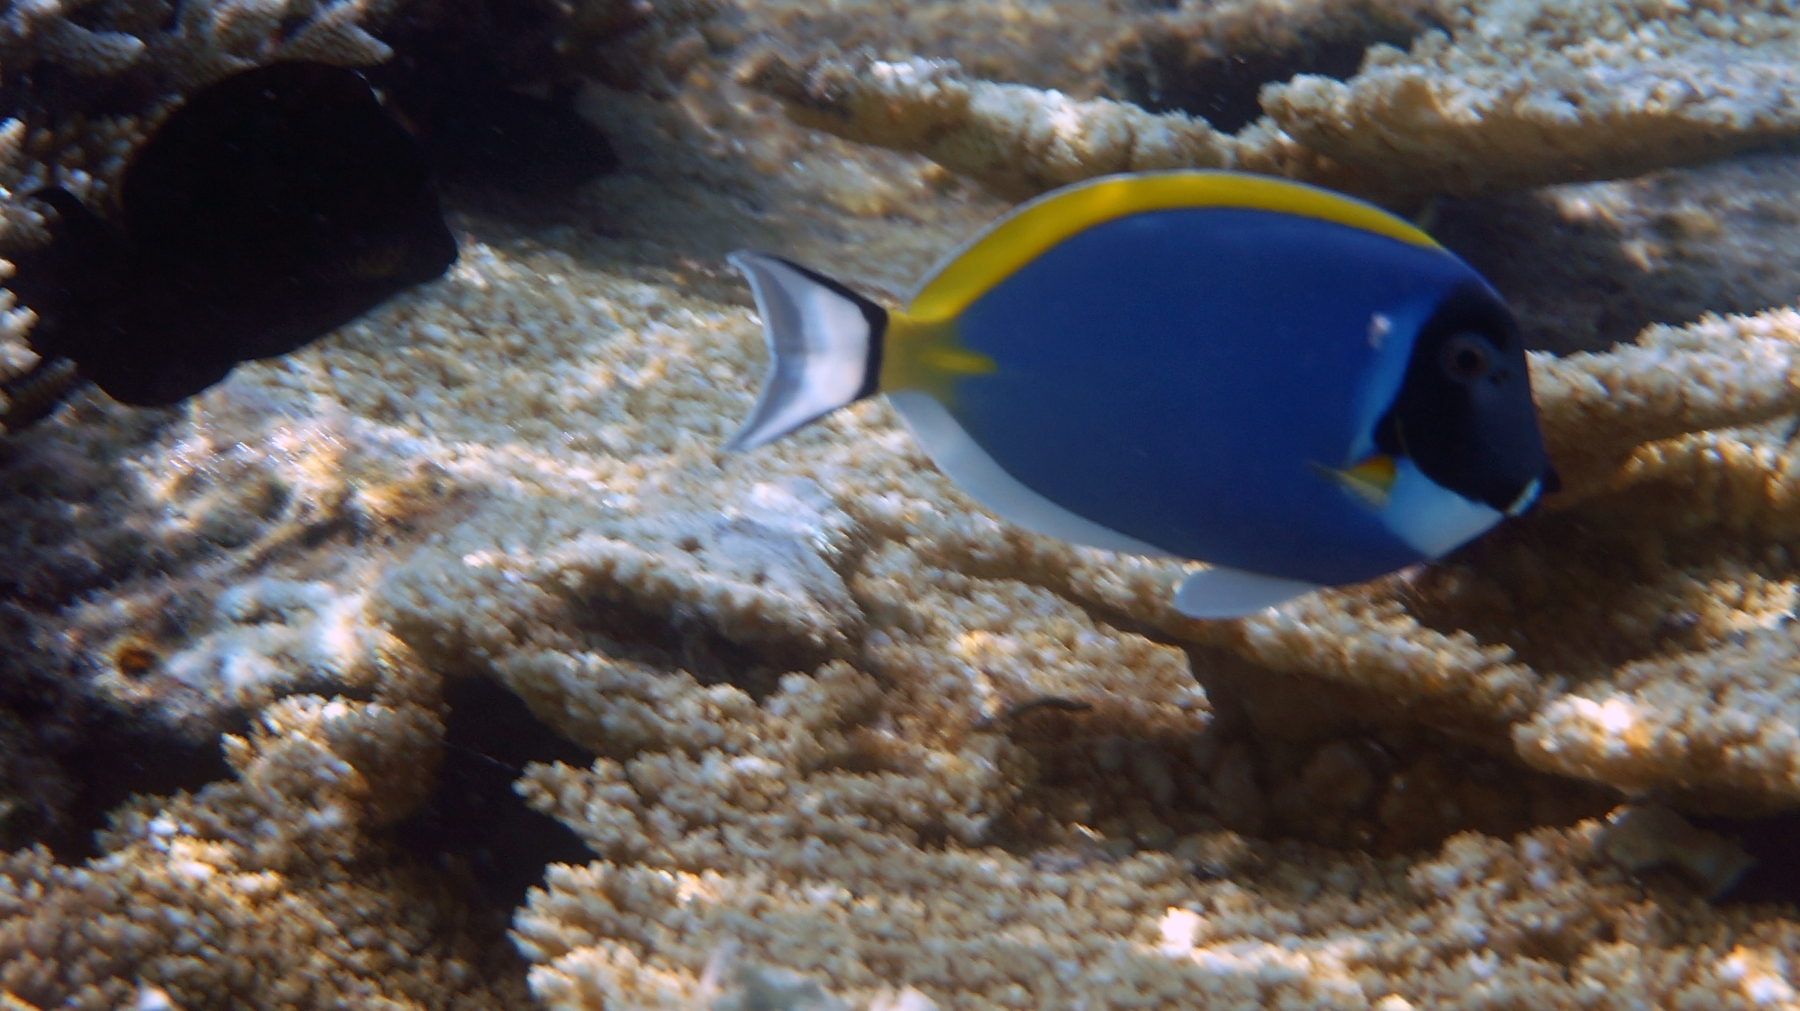 Acanthurus_leucosternon_009_C_Peces-Cirujano_L_Maldivas_U_Sebas_04072015